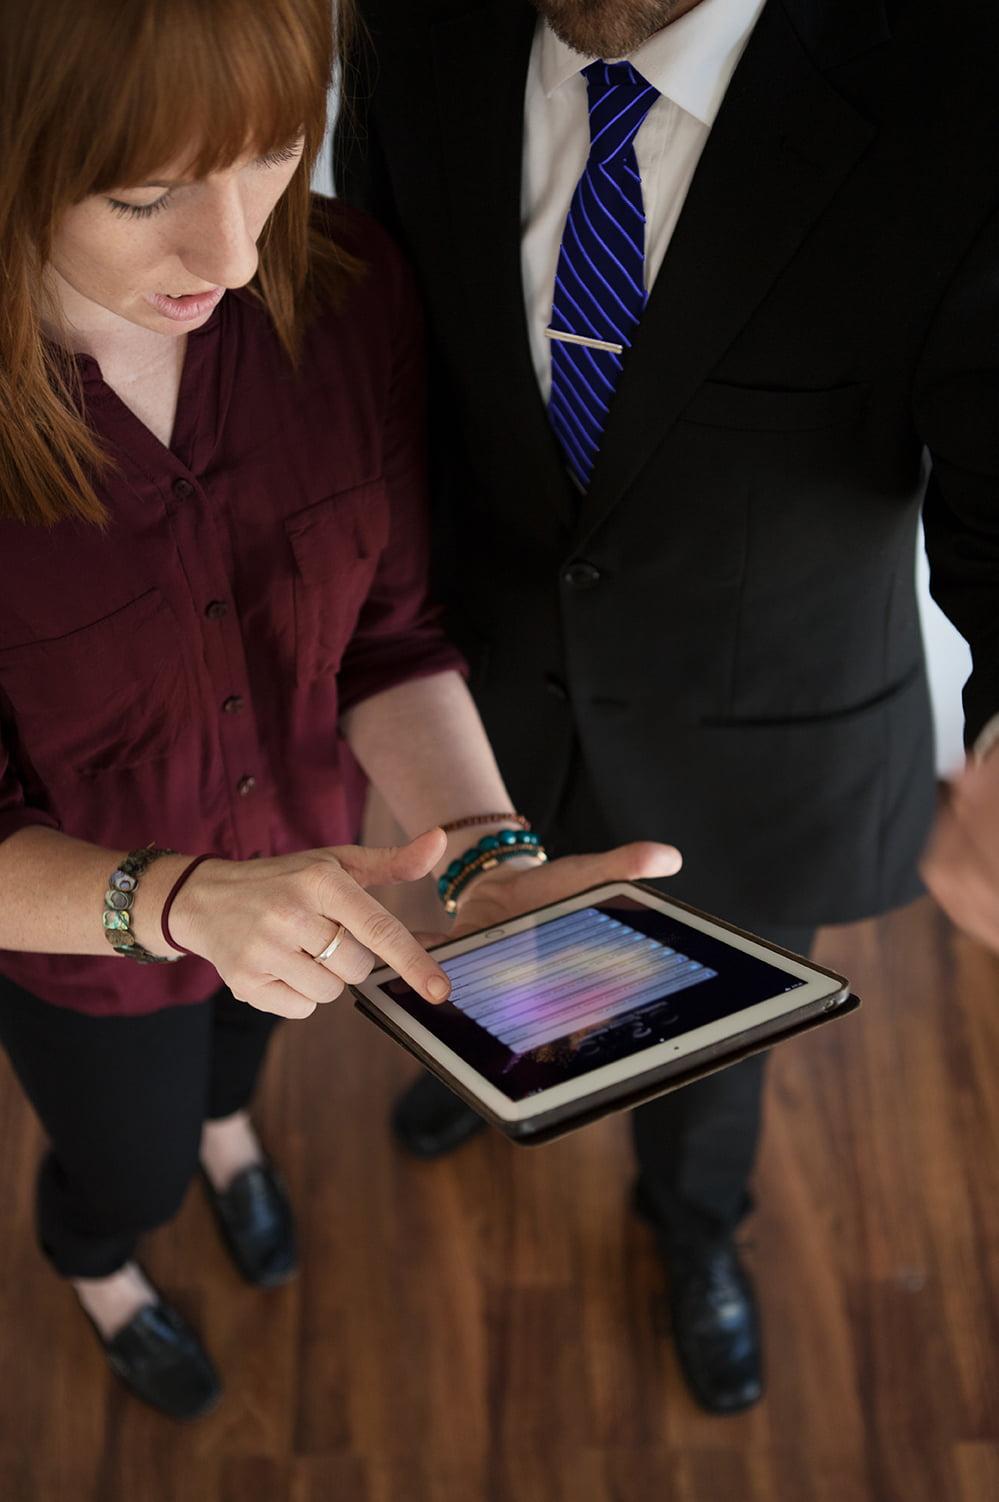 Digital Marketing Trust | 2oddballs Digital Marketing